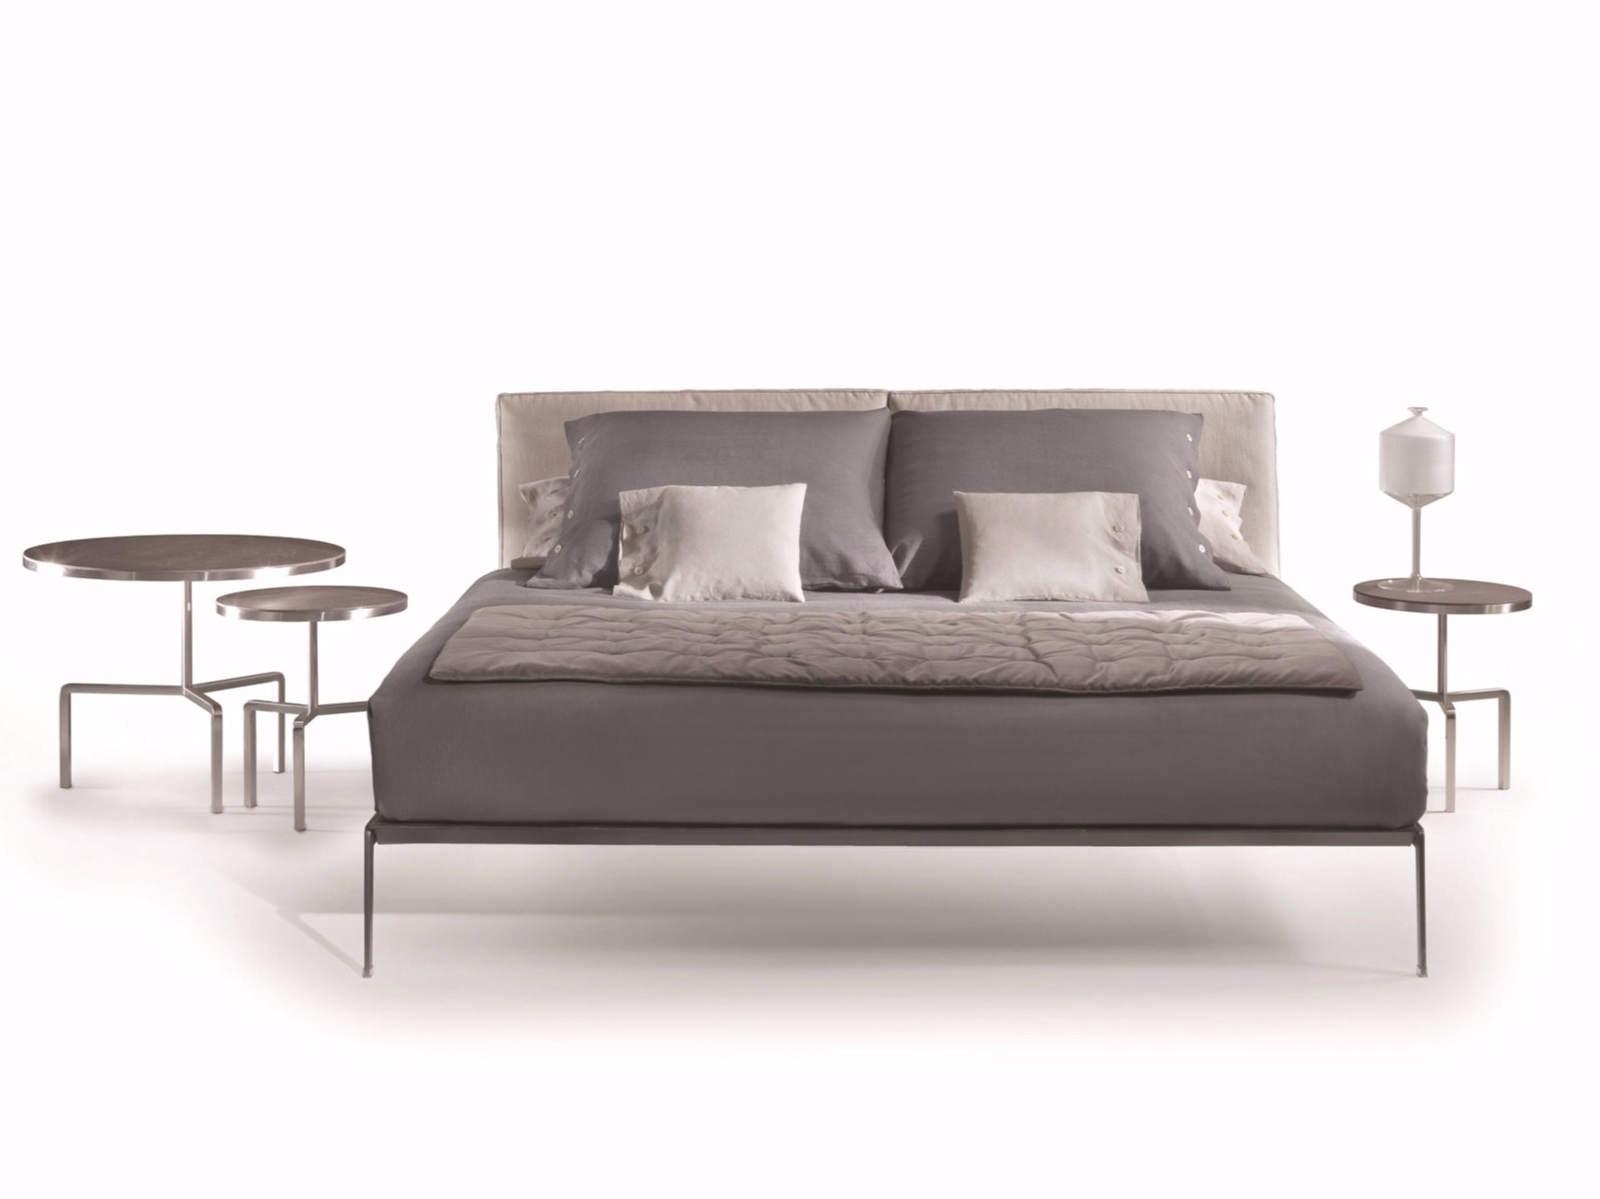 feel good ten letto flexform acquista online. Black Bedroom Furniture Sets. Home Design Ideas